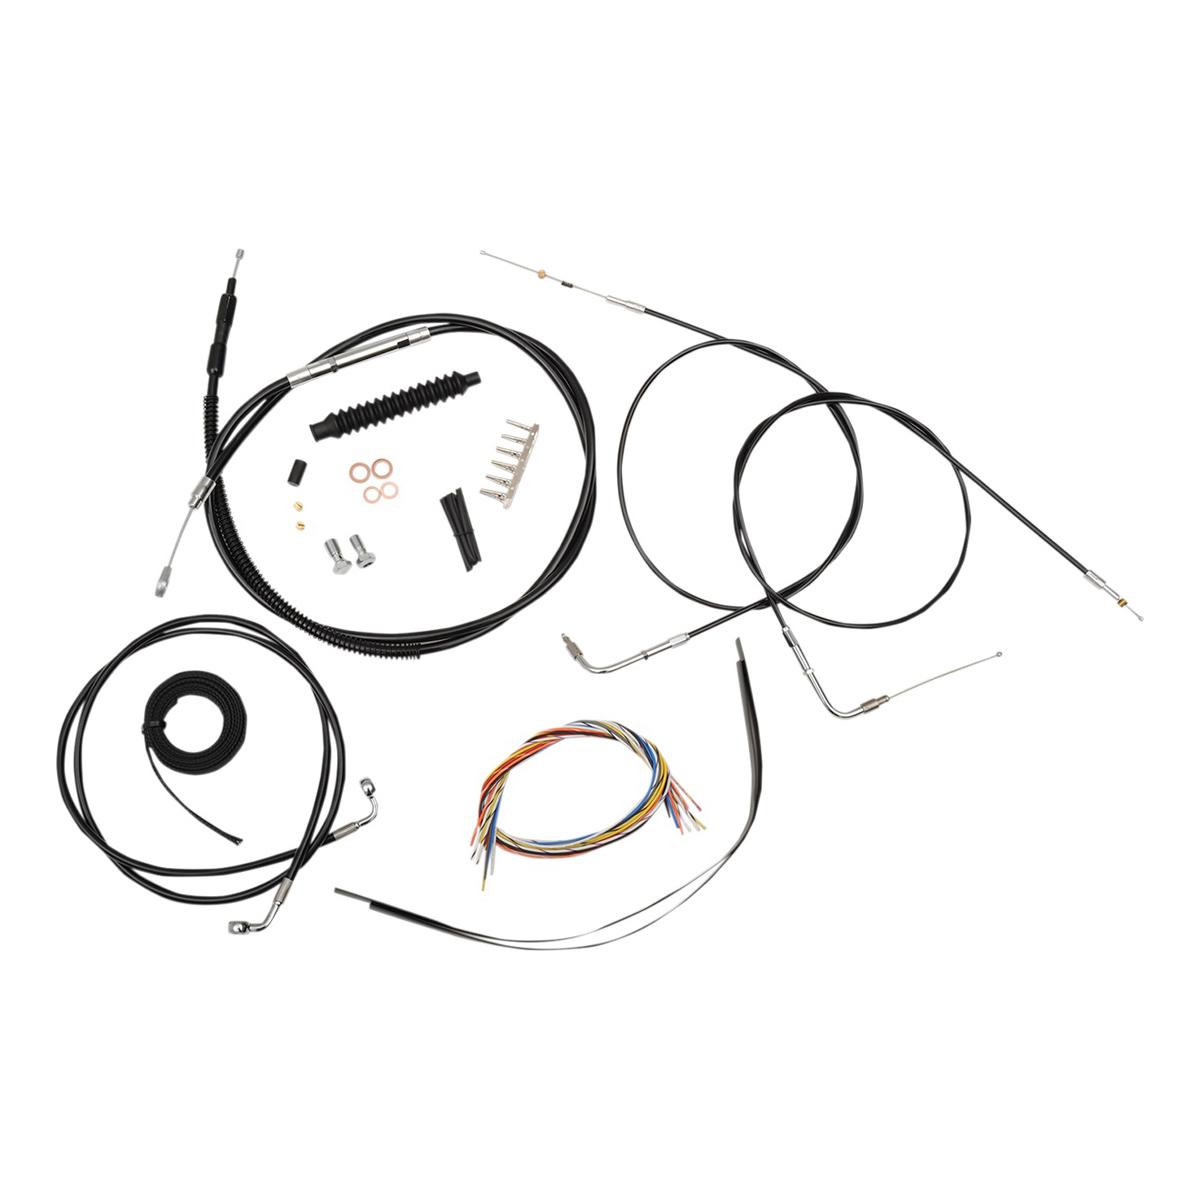 La Choppers Black Complete Cable Line Wiring Handlebar Kit For Mini Ape Bars